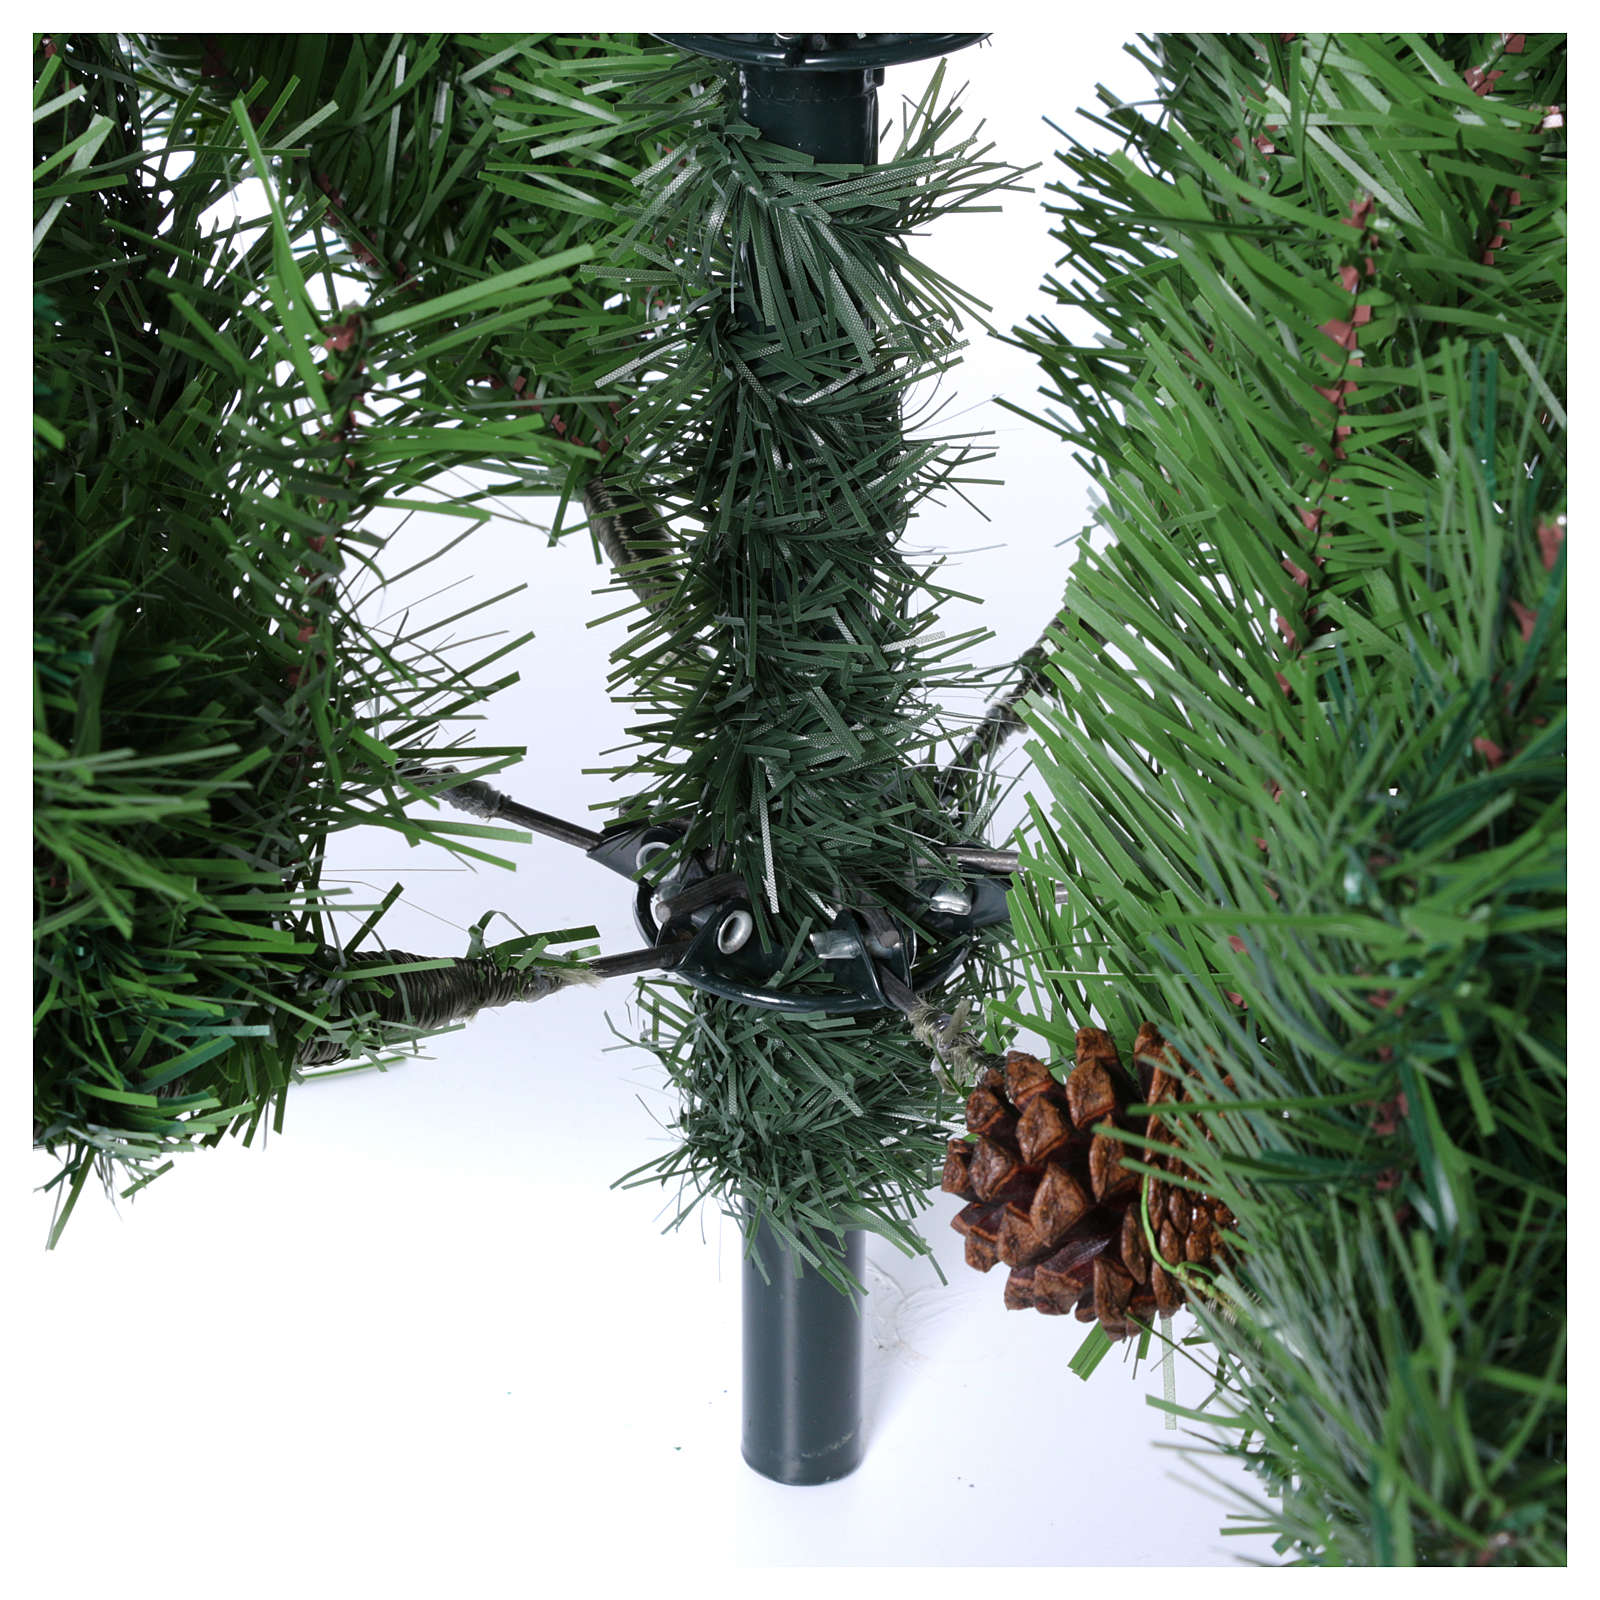 Albero Di Natale Slim 210.Albero Di Natale 210 Cm Slim Memory Shape Verde Con Pigne Norimberga